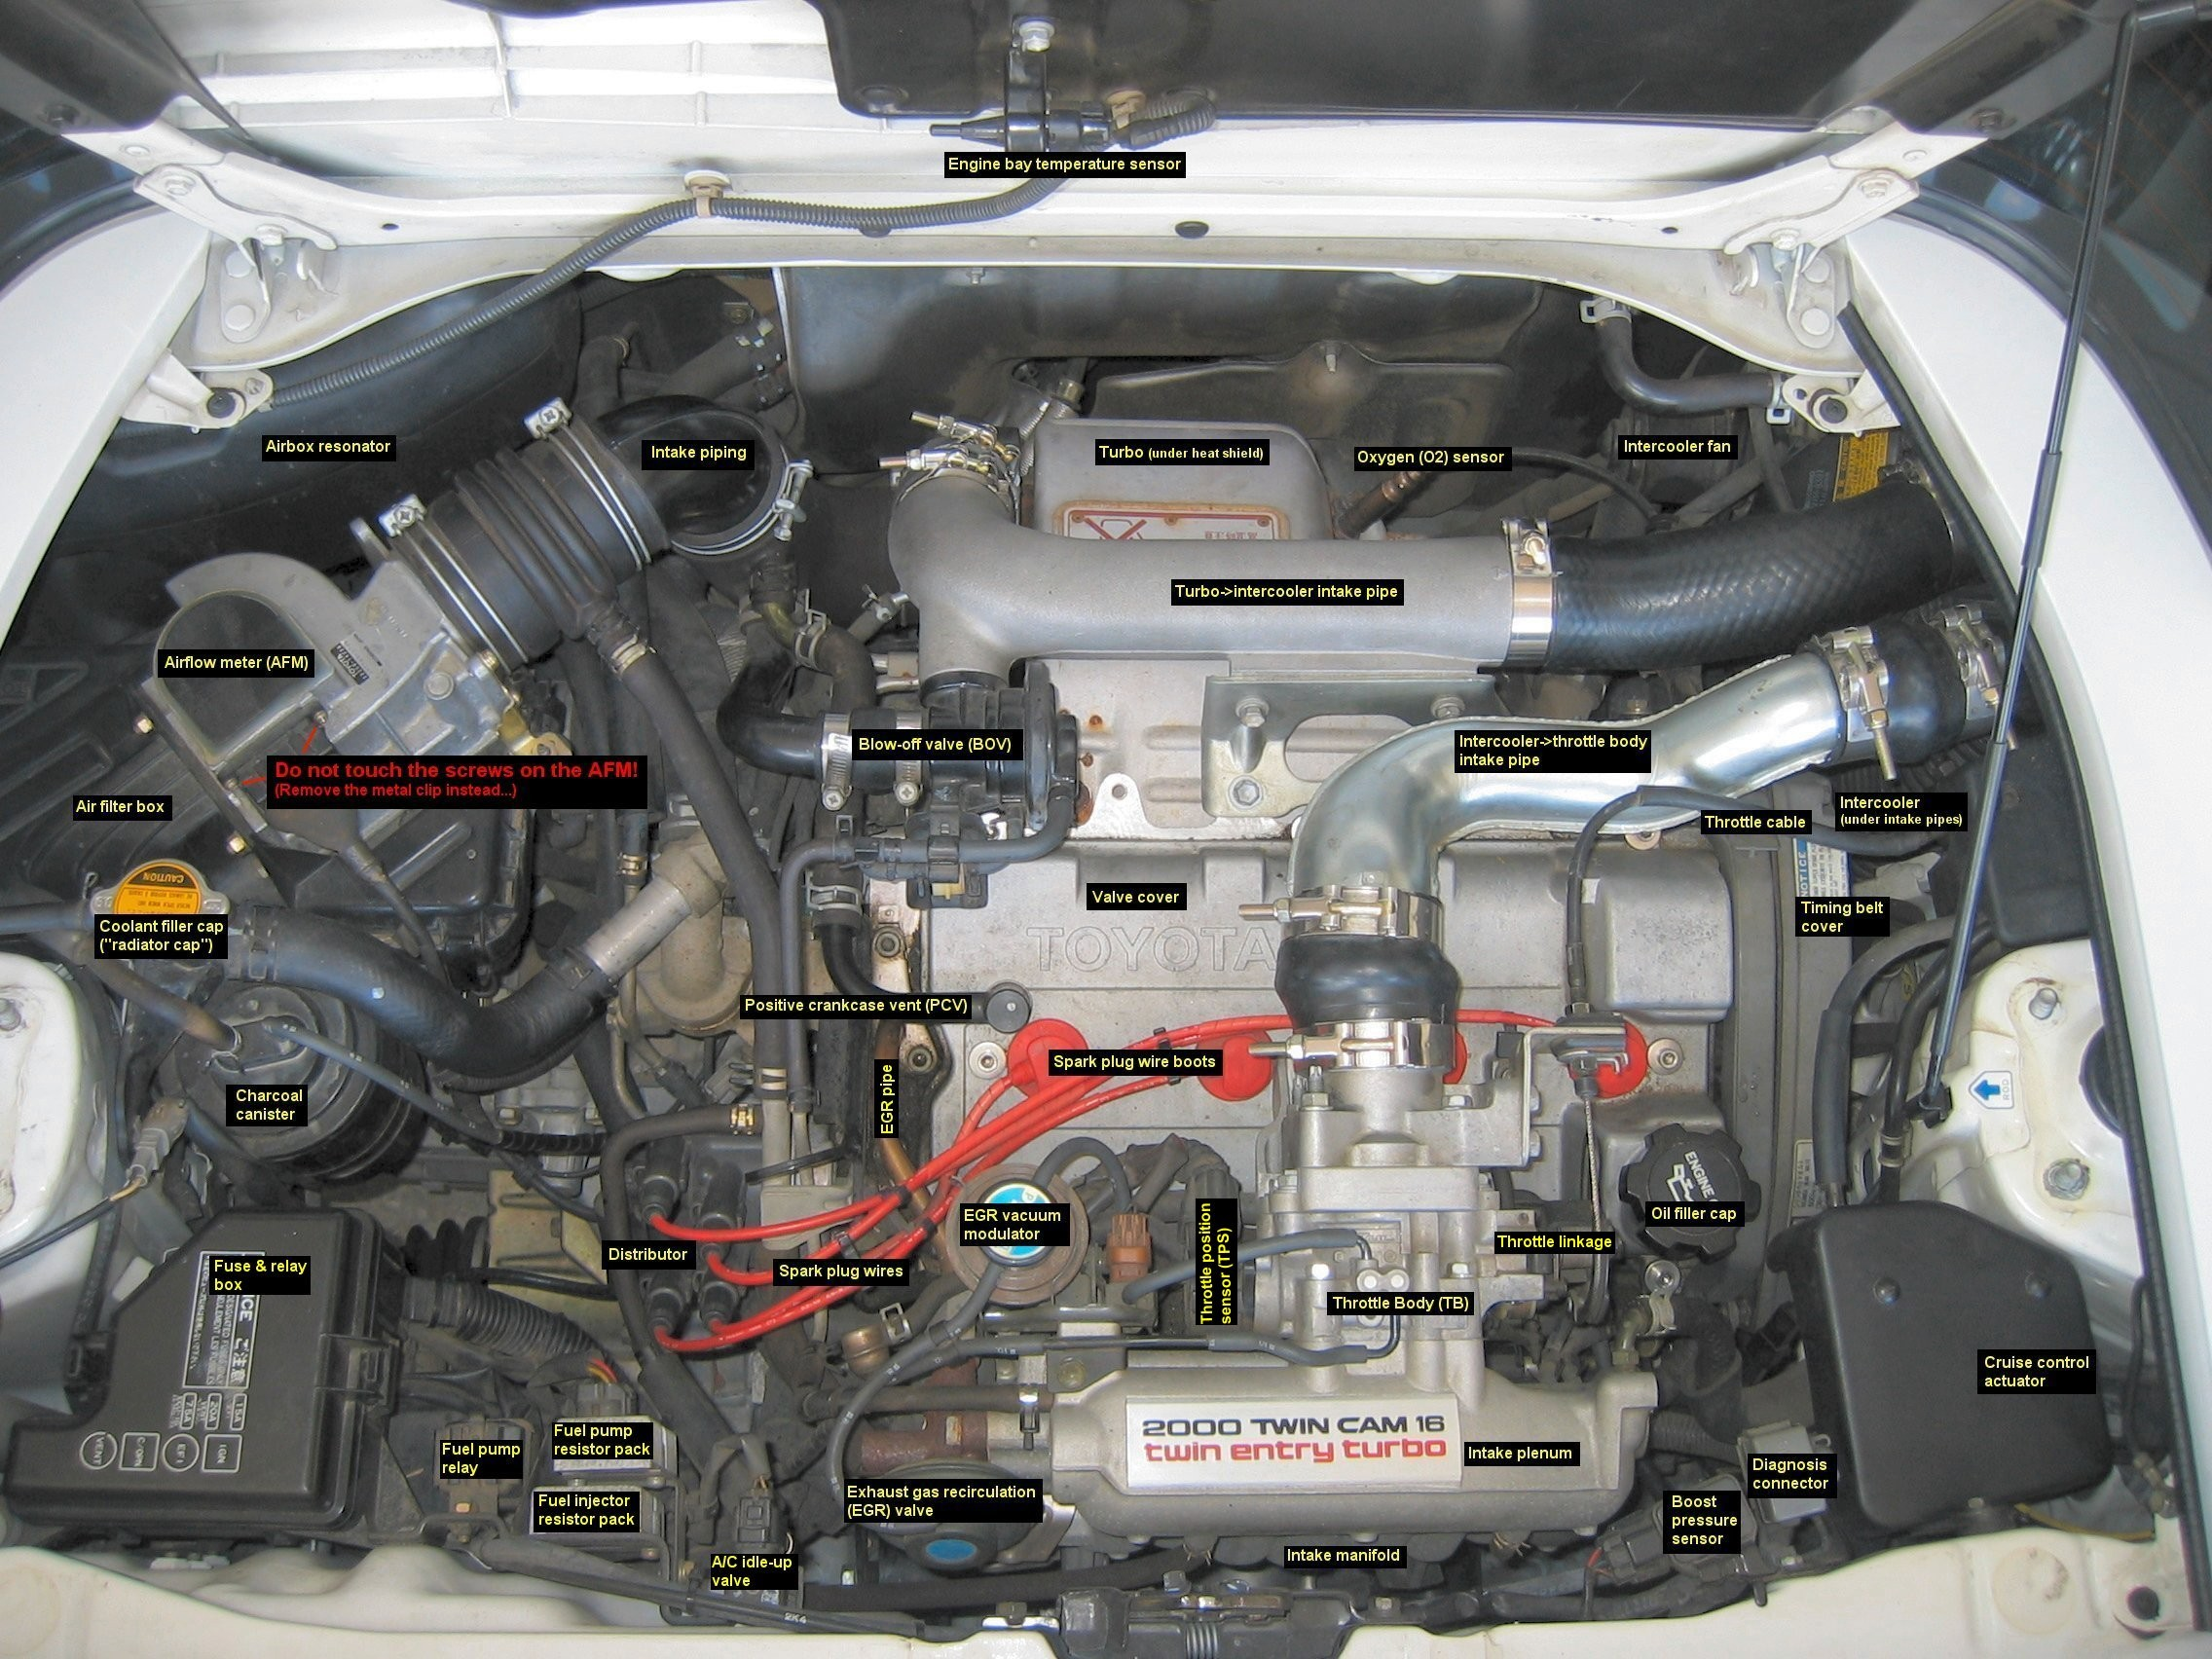 2000 Toyota Celica Gt Engine Diagram My Wiring 1993 Shiny Donuts Performance Turbo Swap 6th